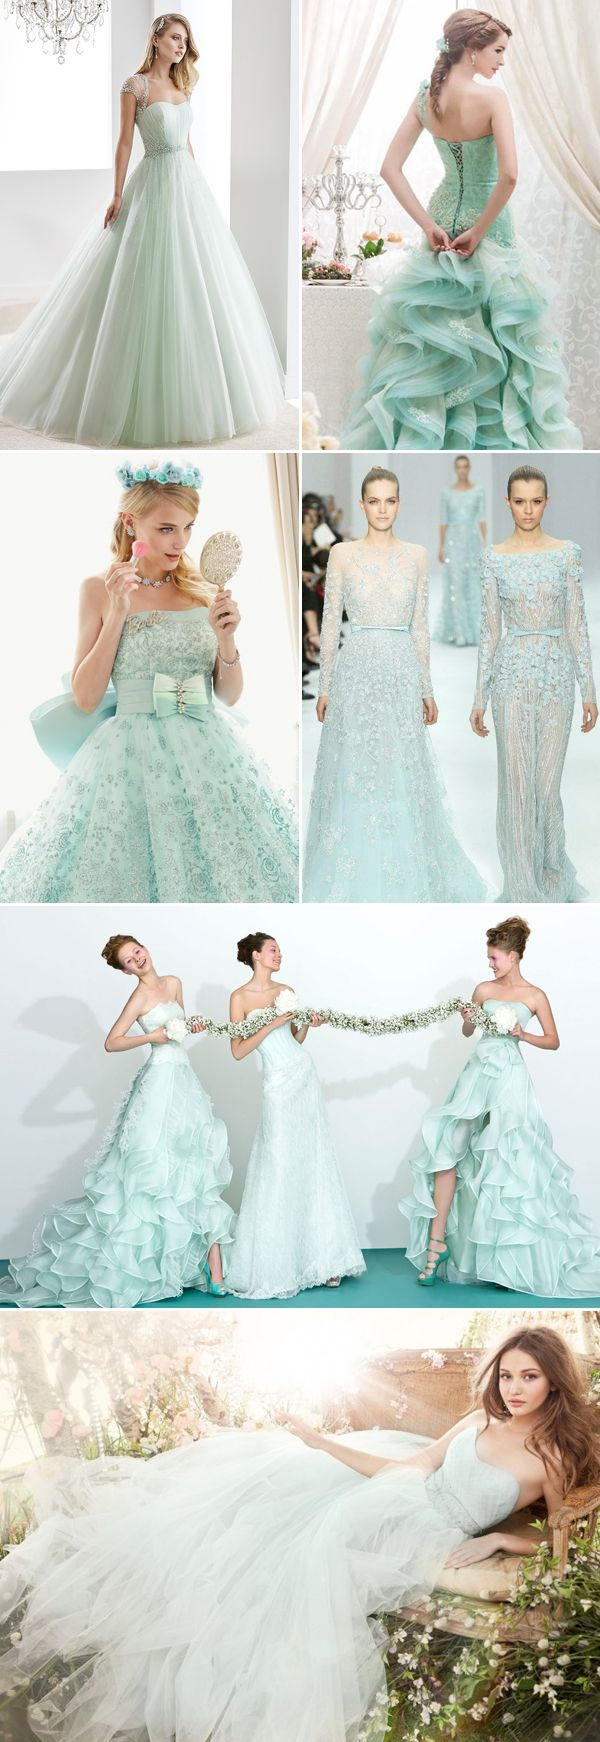 Pastel Pink Colored Wedding Dresses   Dress images